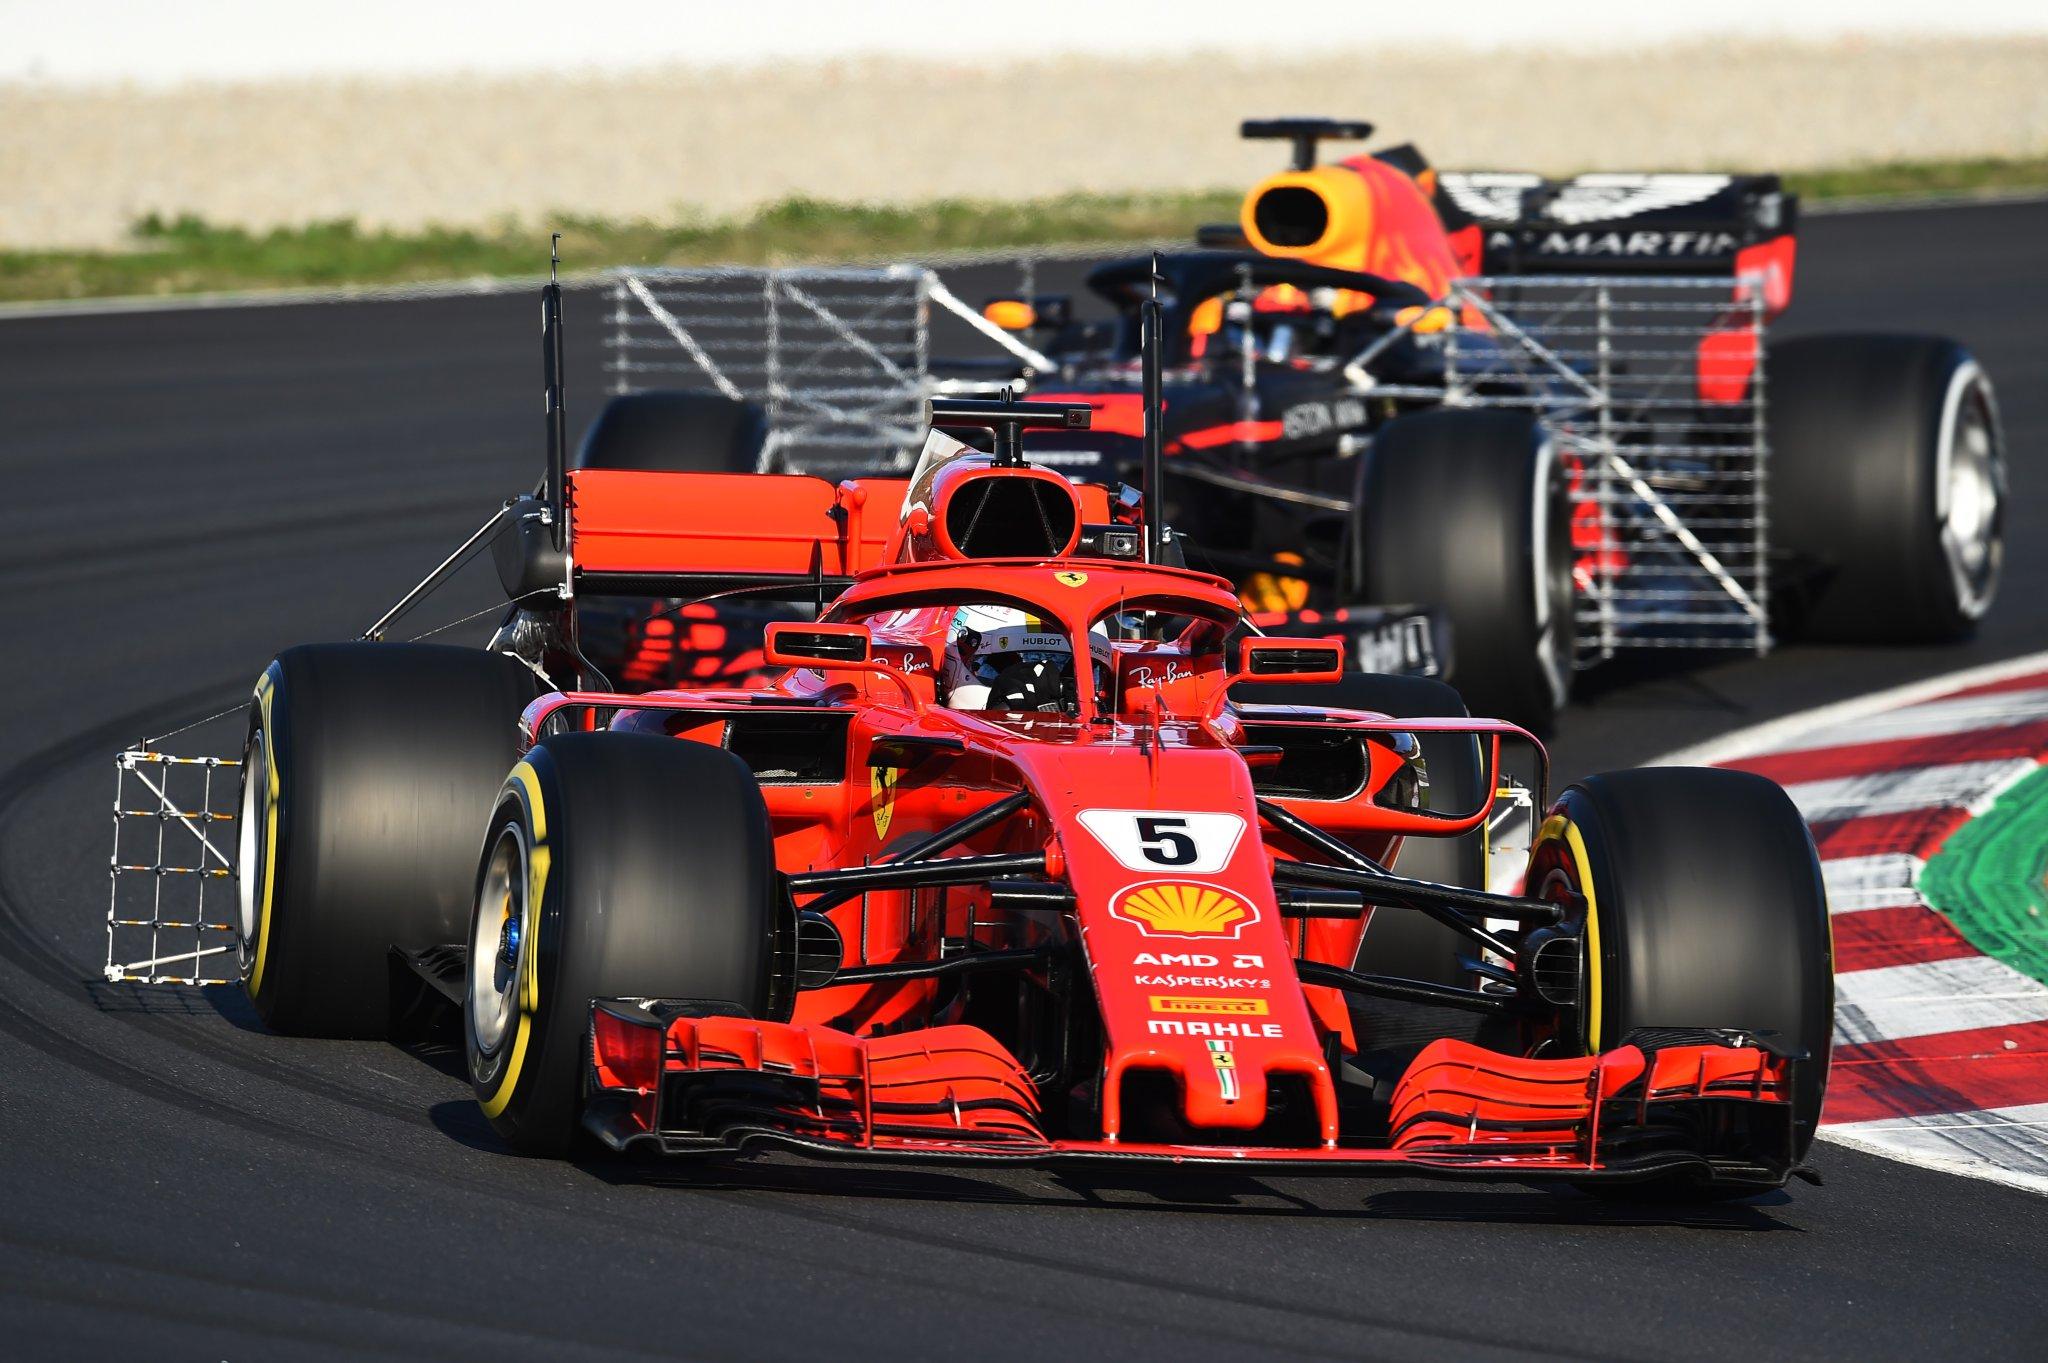 Датчики на болидах Ф1 на тестах в Барселоне